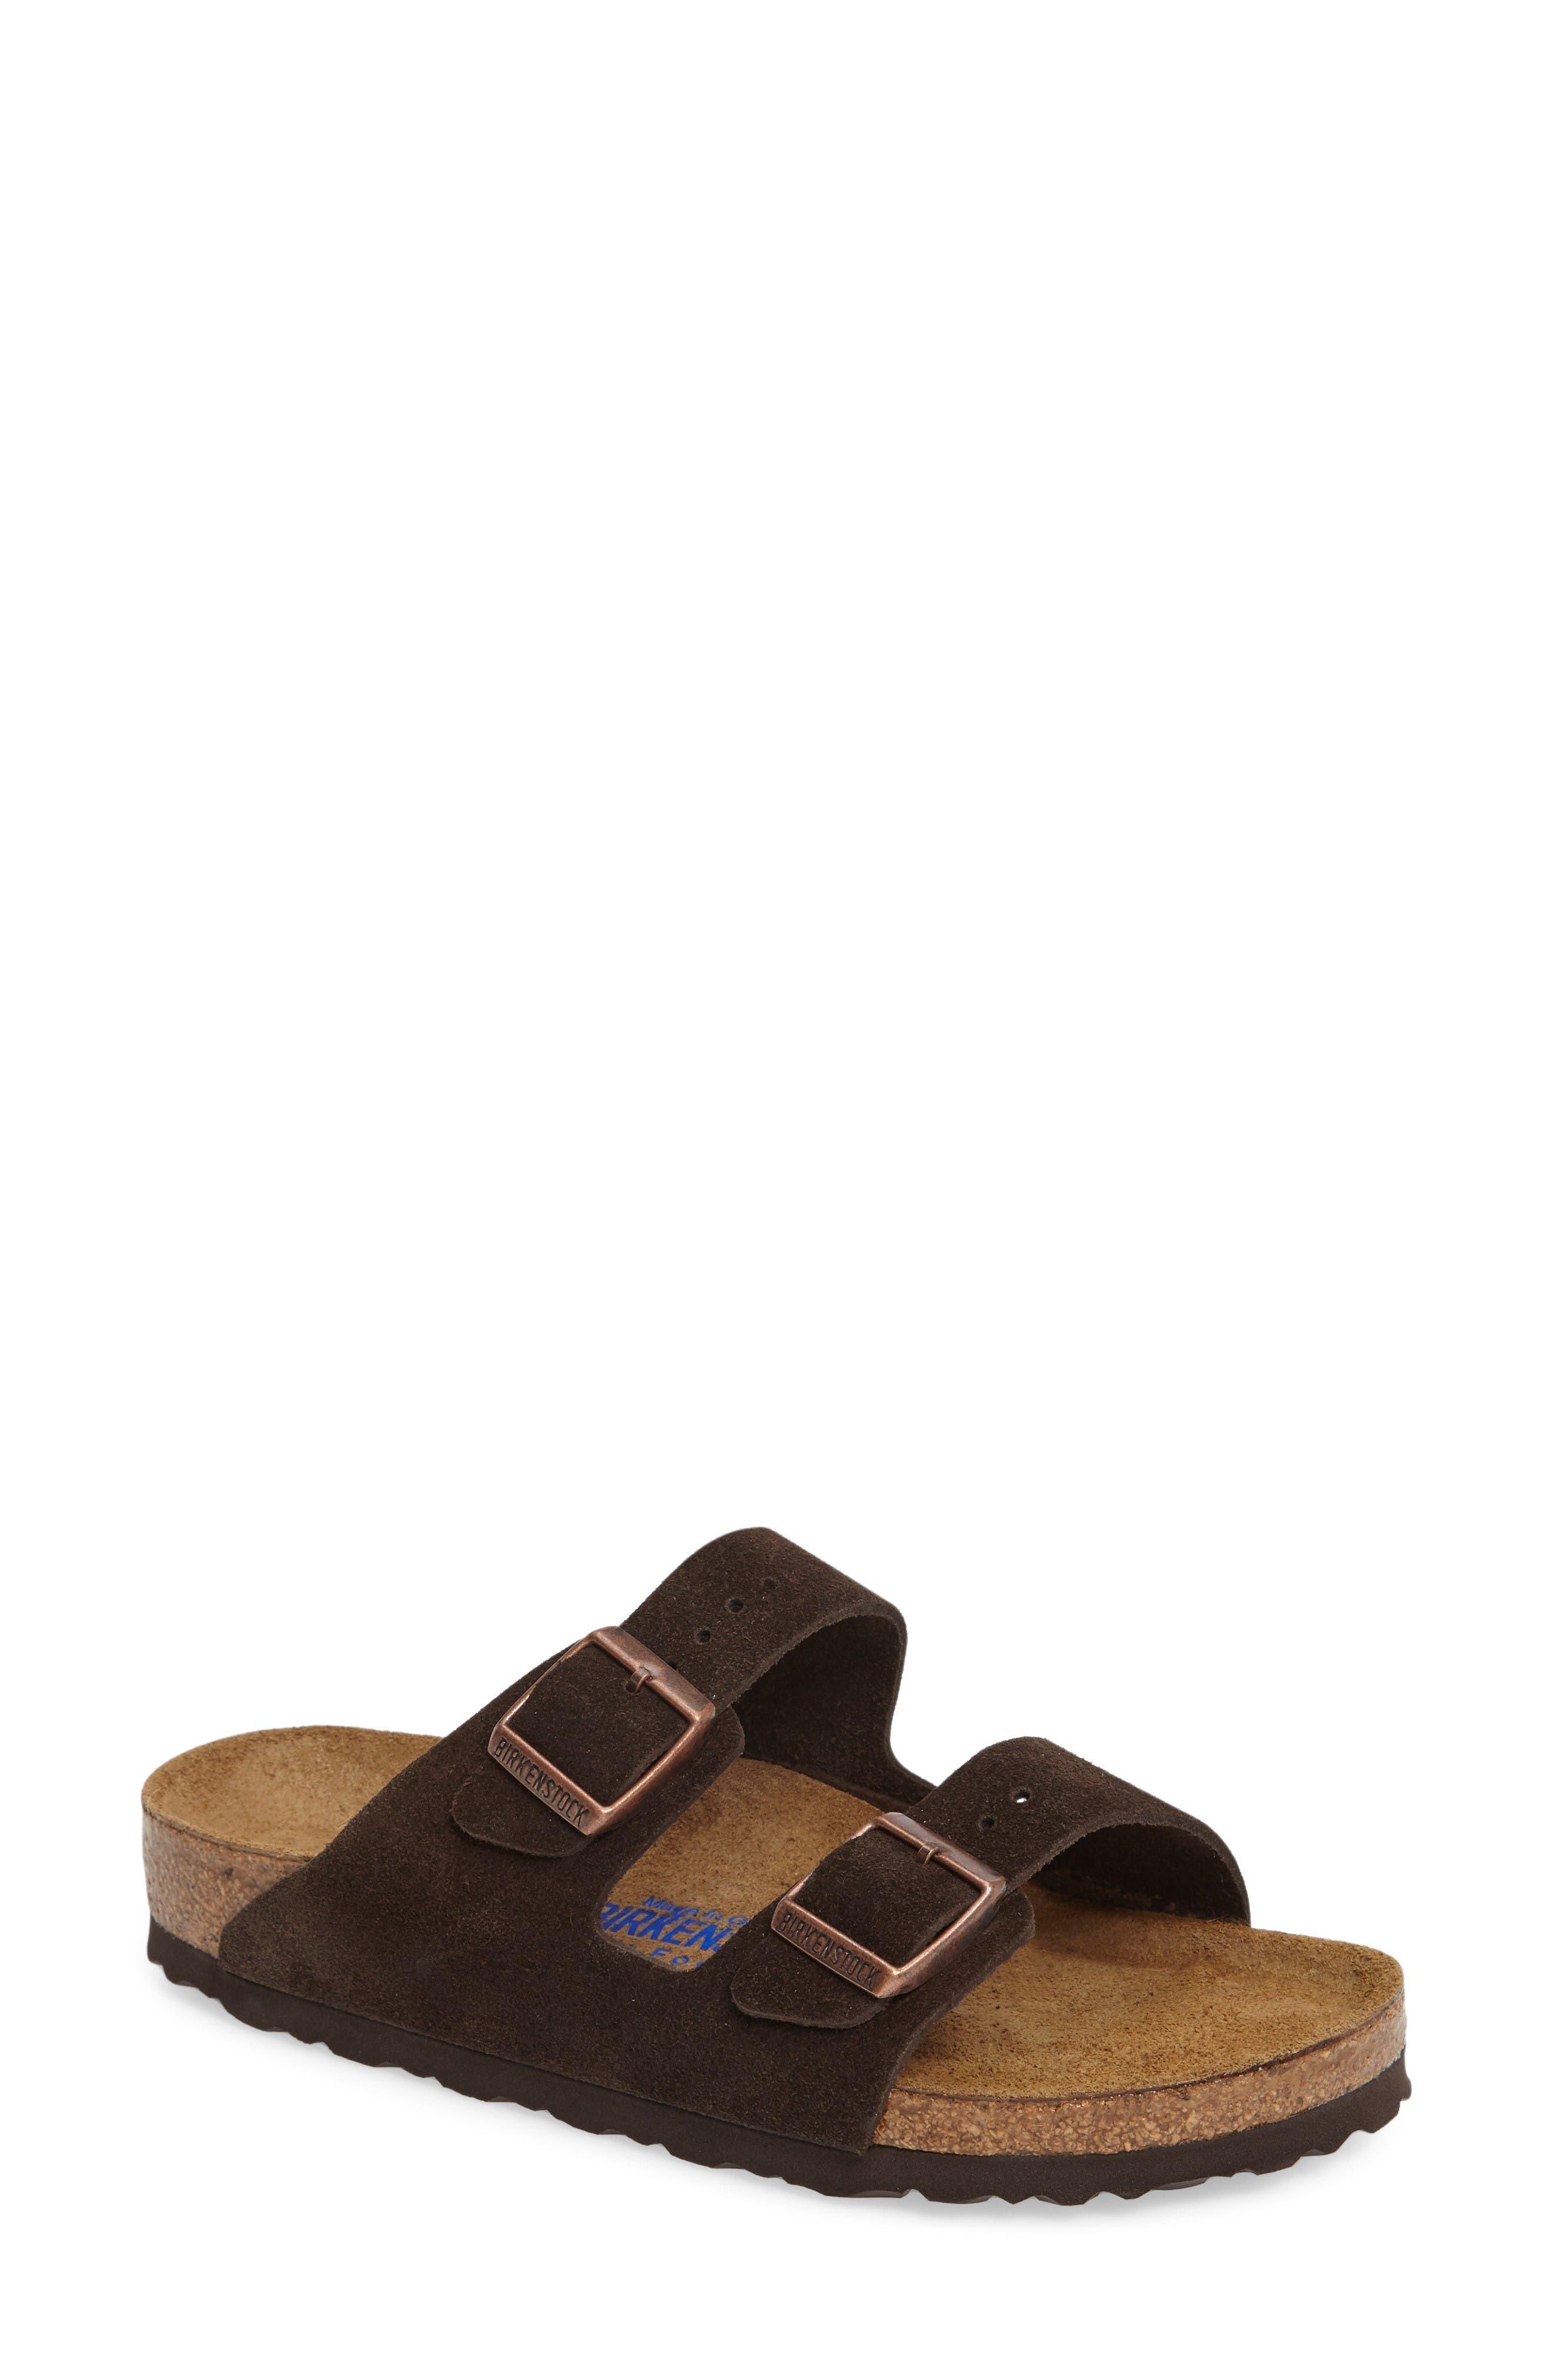 Alternate Image 1 Selected - Birkenstock 'Arizona' Soft Footbed Suede Sandal (Women)